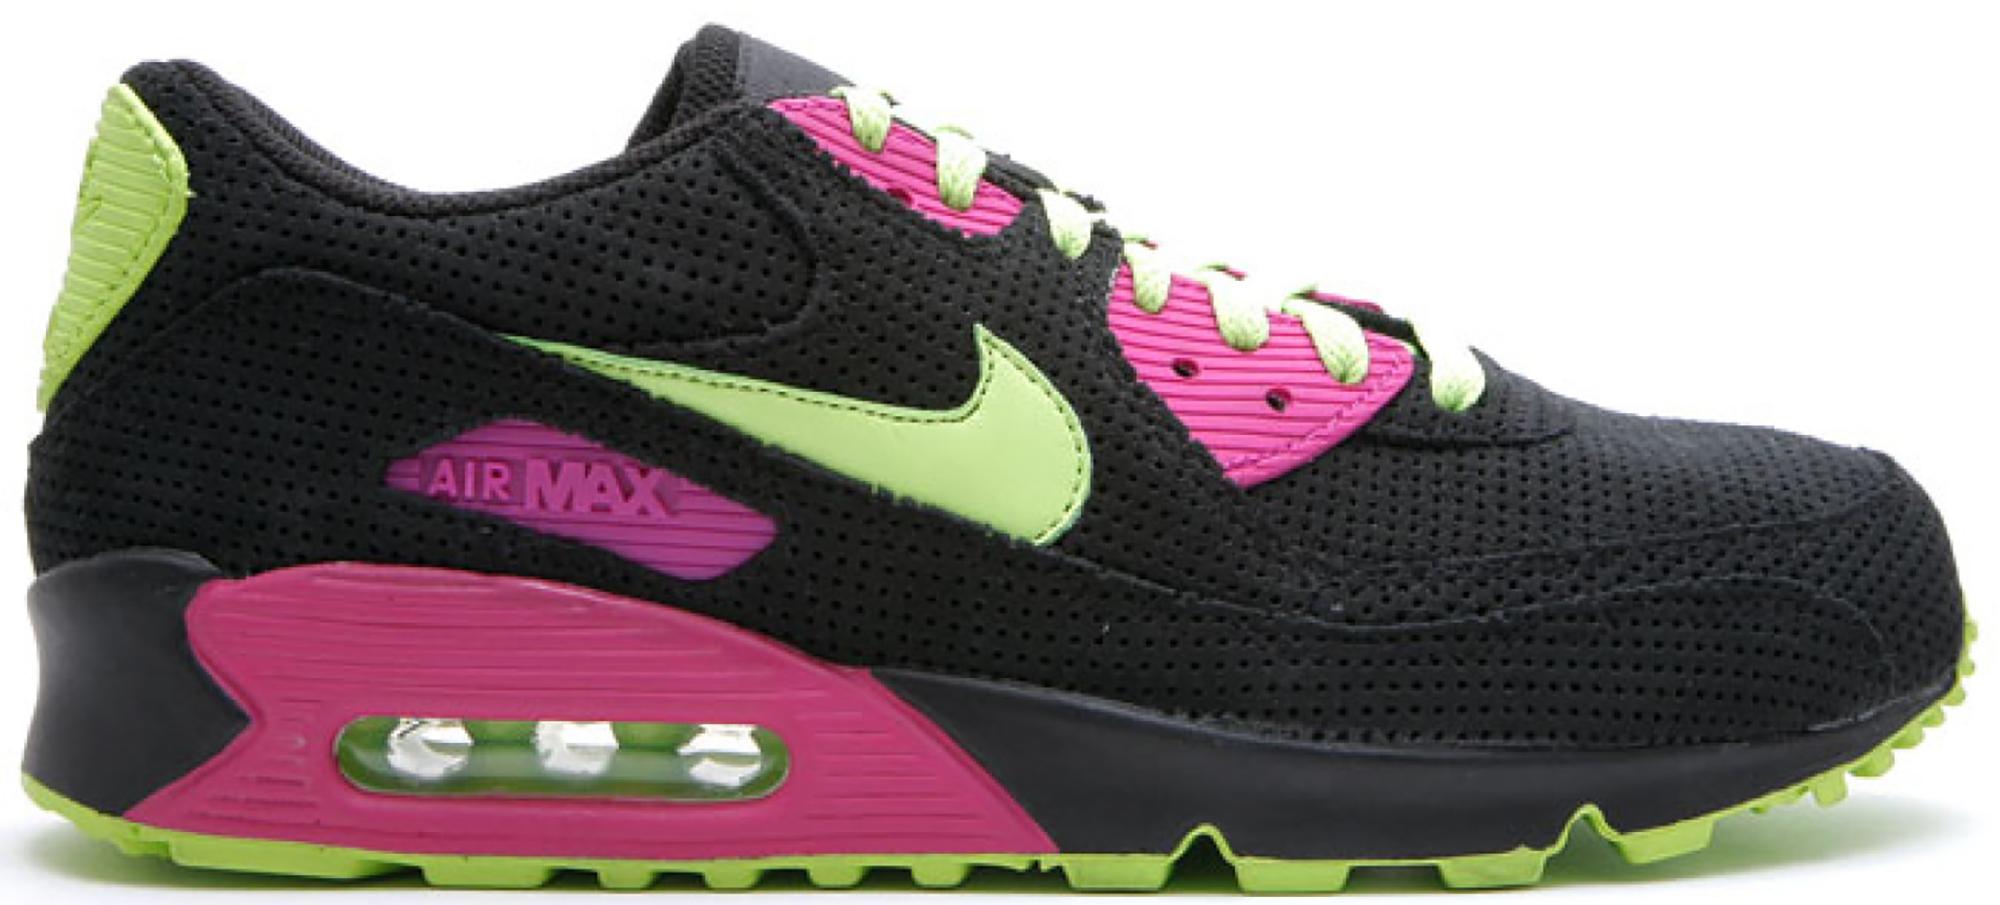 Nike Air Max 90 Black Citron Rave Pink